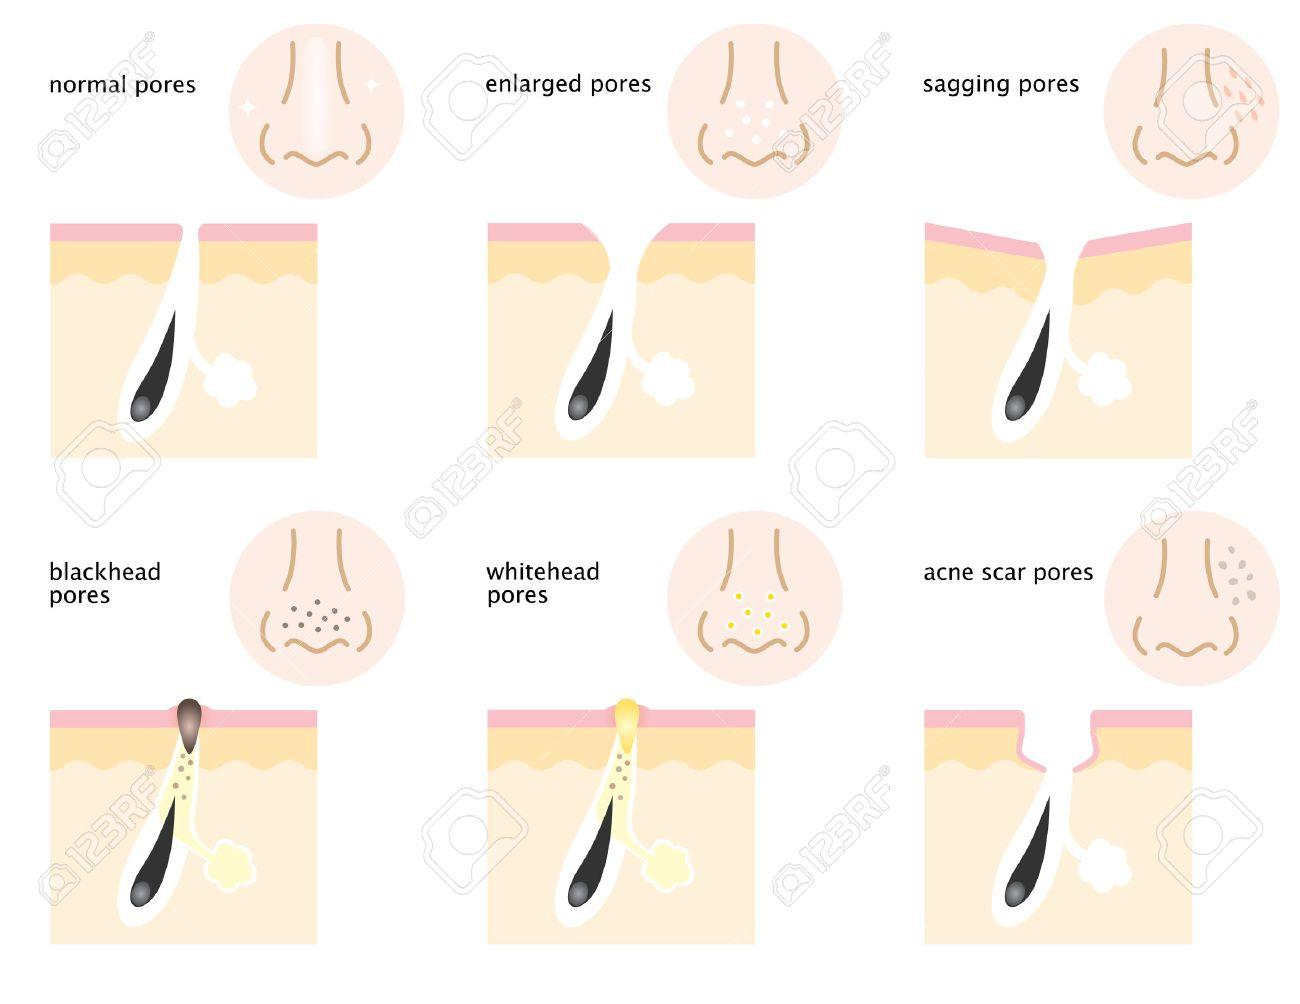 There are kinds of skin pores on nose and cheeks, normal pores, sagging pores, open pores, blackhead pores, whitehead pores, and acne scar pores. - 63202043